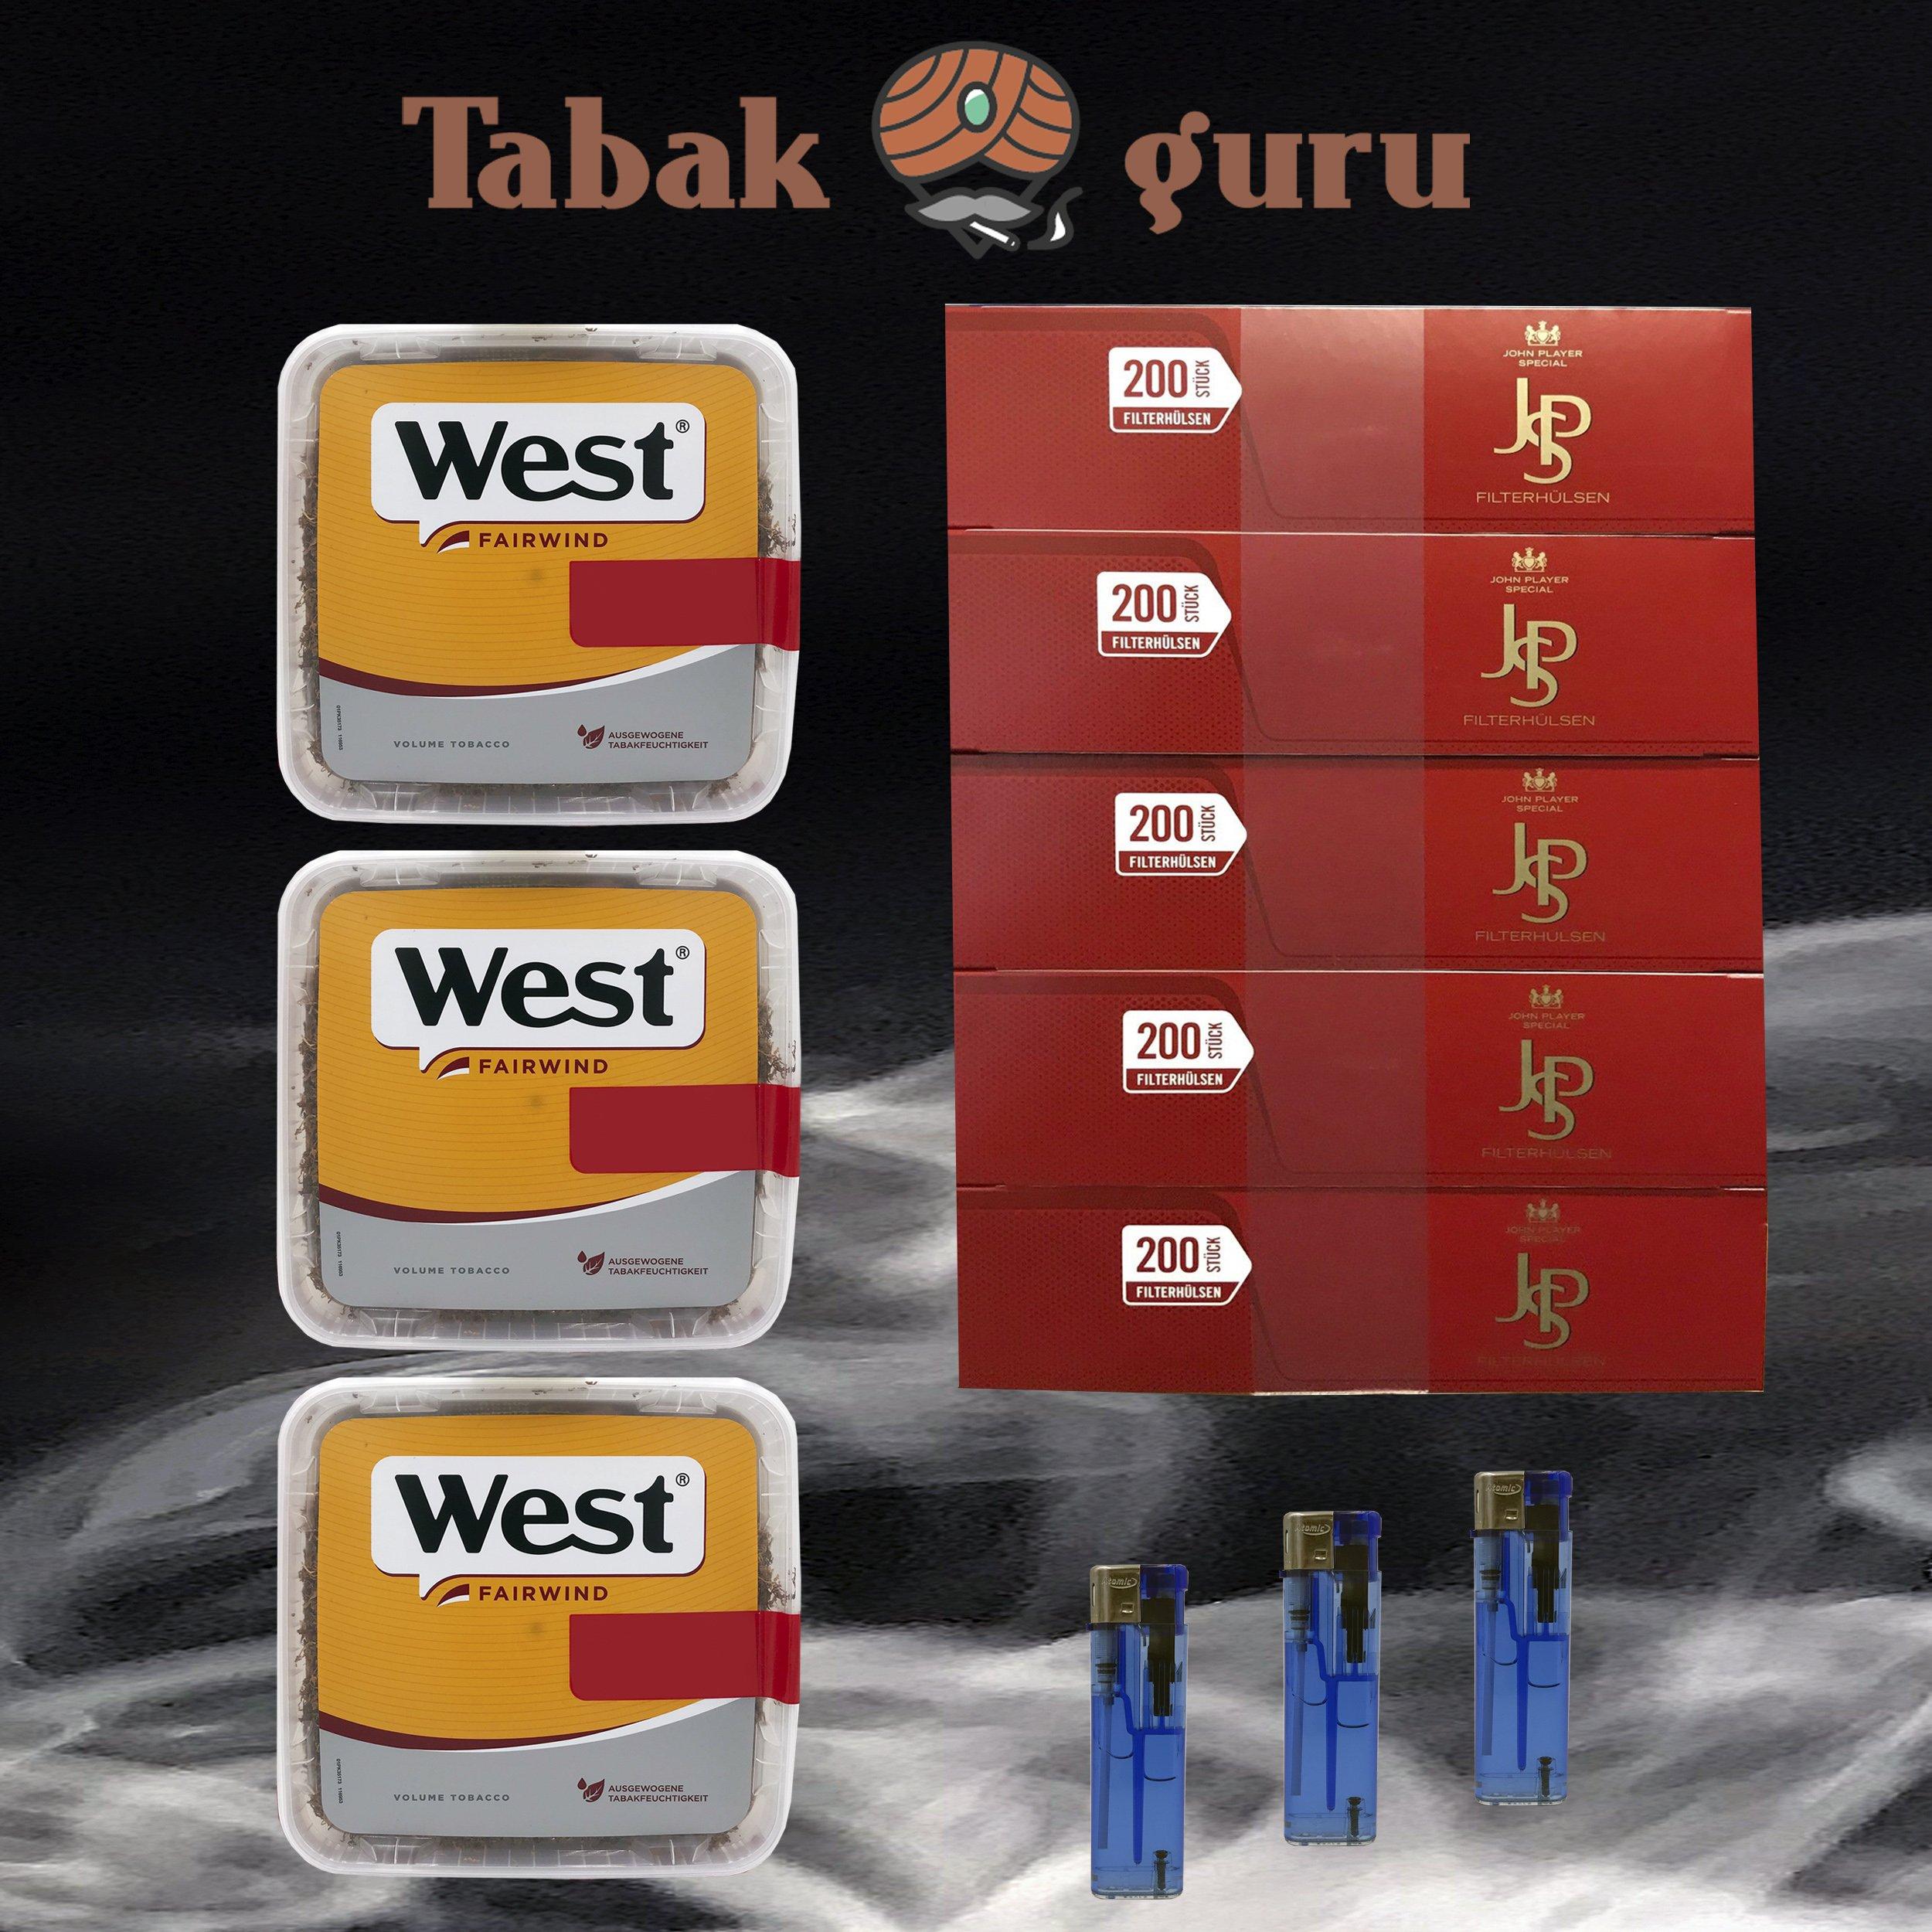 3x West Yellow Tabak Jumbo Box 185g, John Player Hülsen, Feuerzeuge